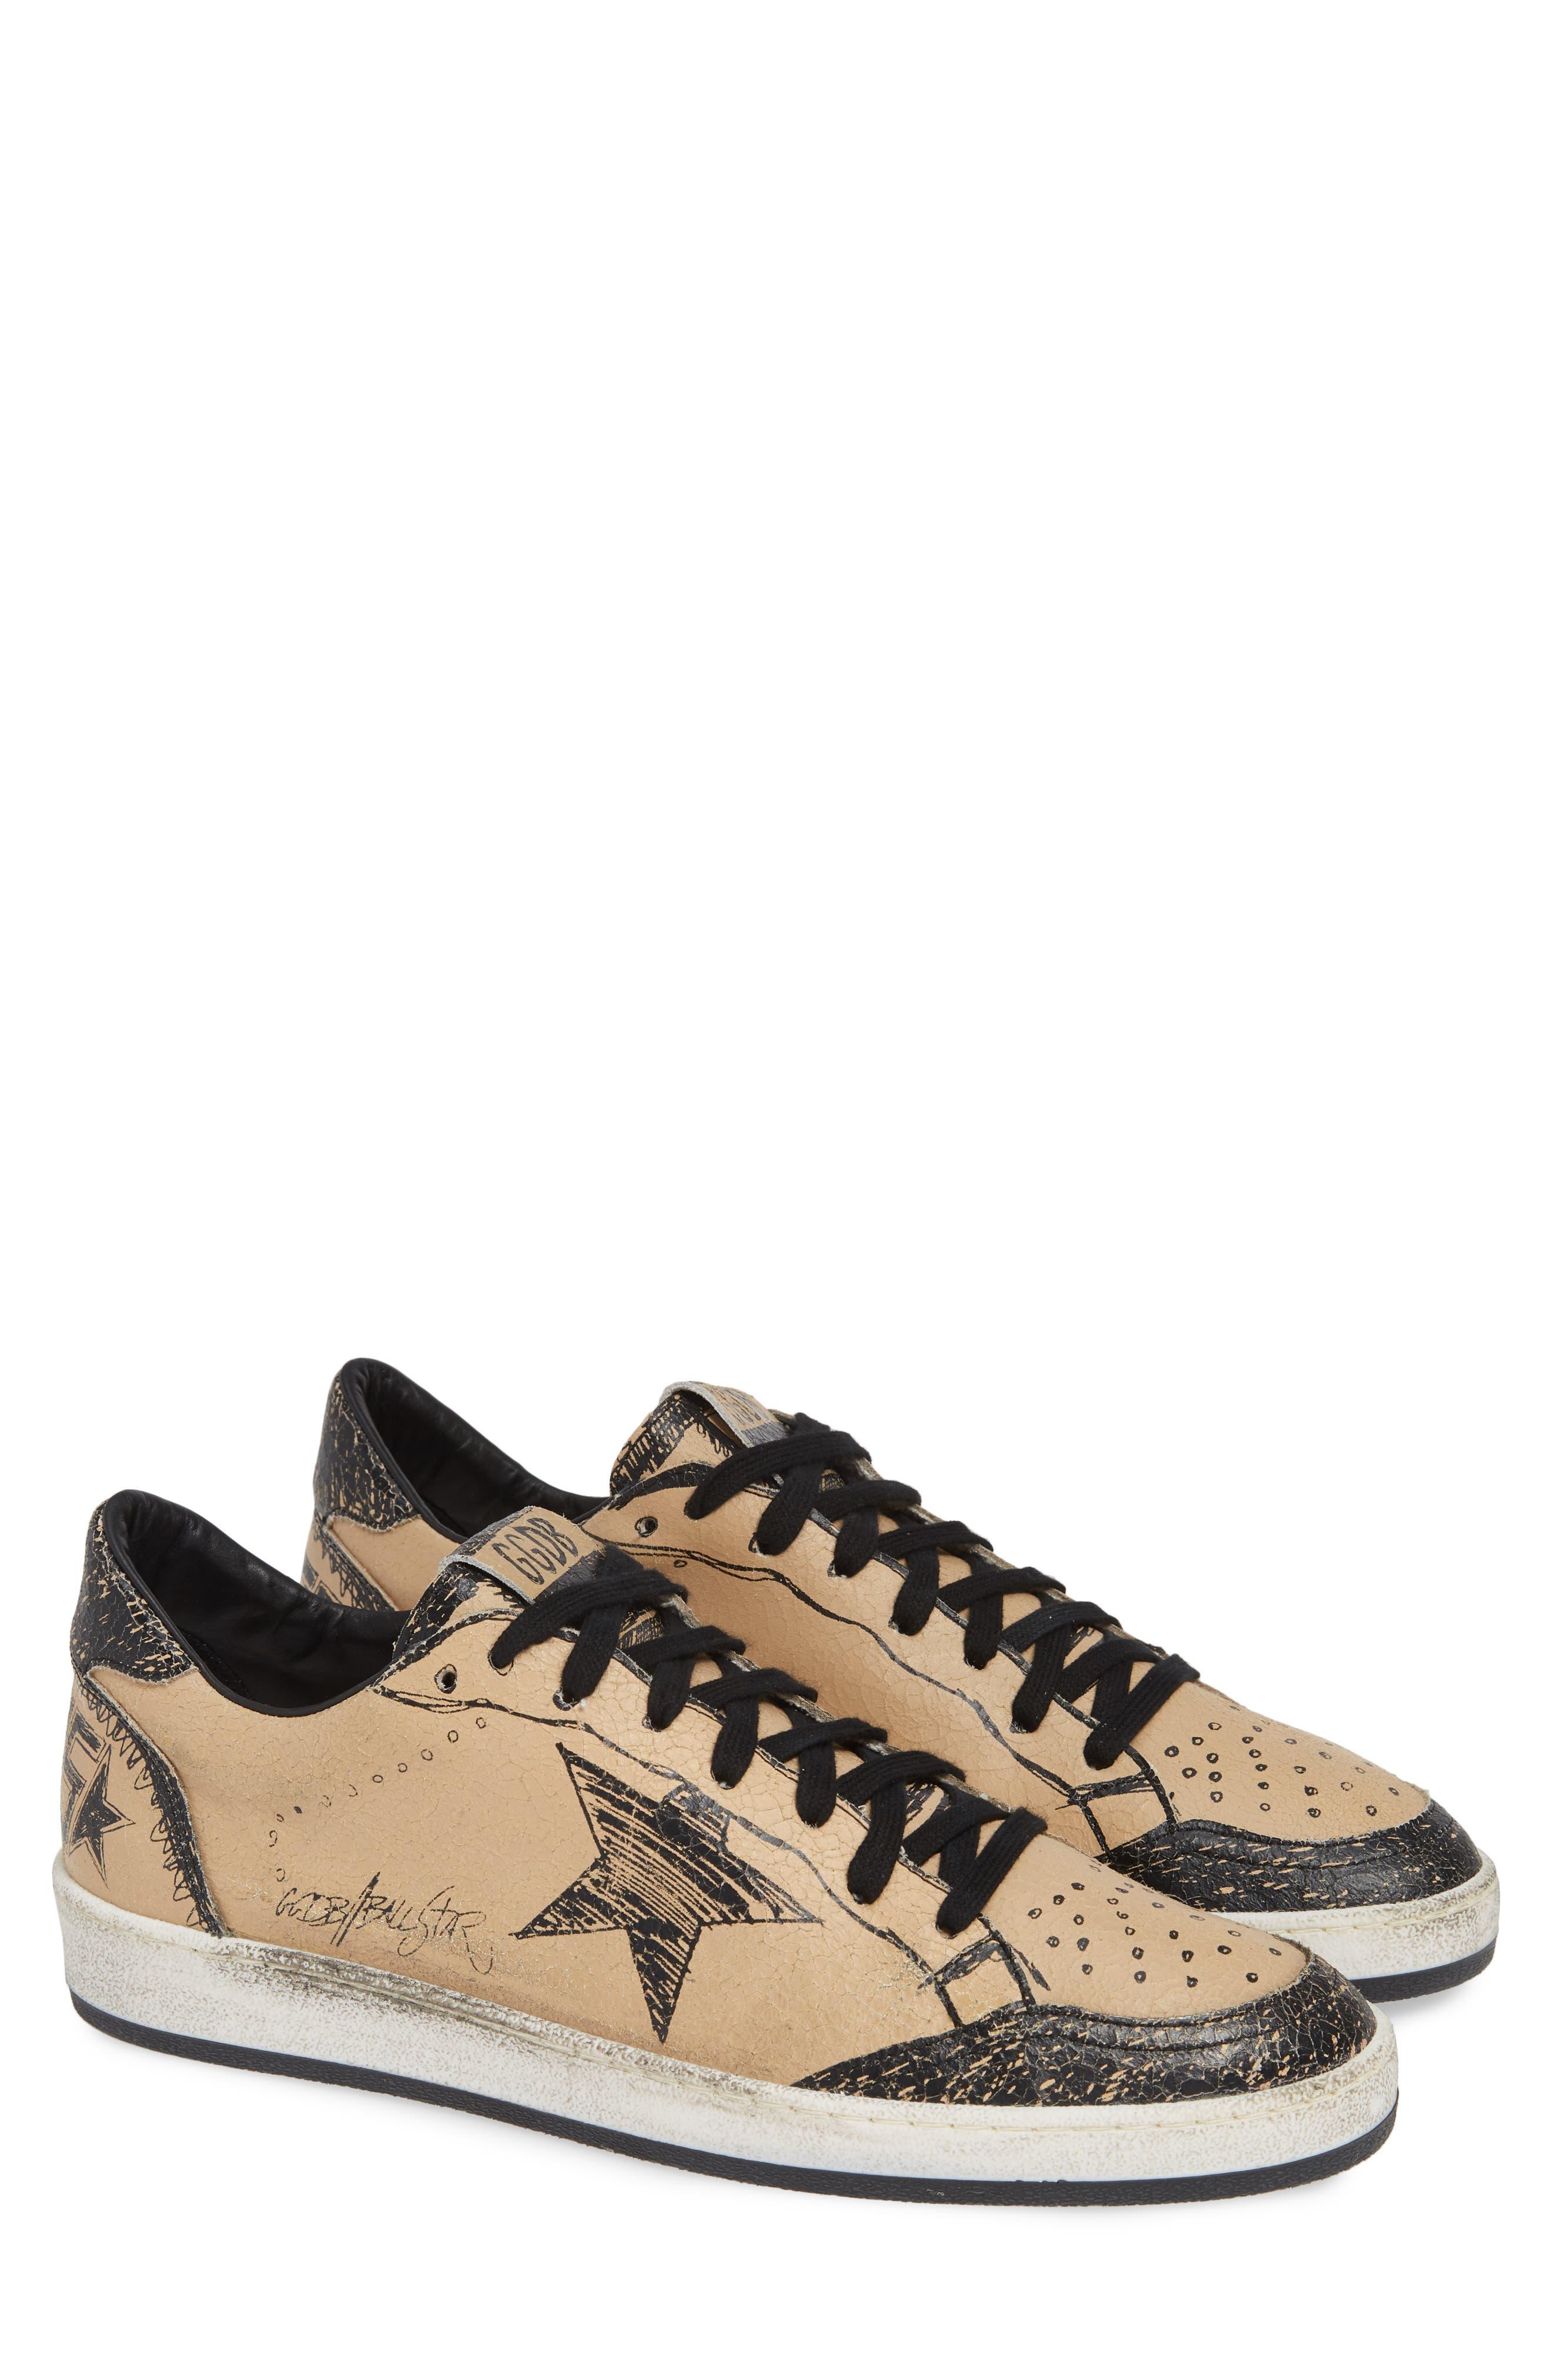 GOLDEN GOOSE, B-Ball Star Sneaker, Main thumbnail 1, color, BLACK DRAWING